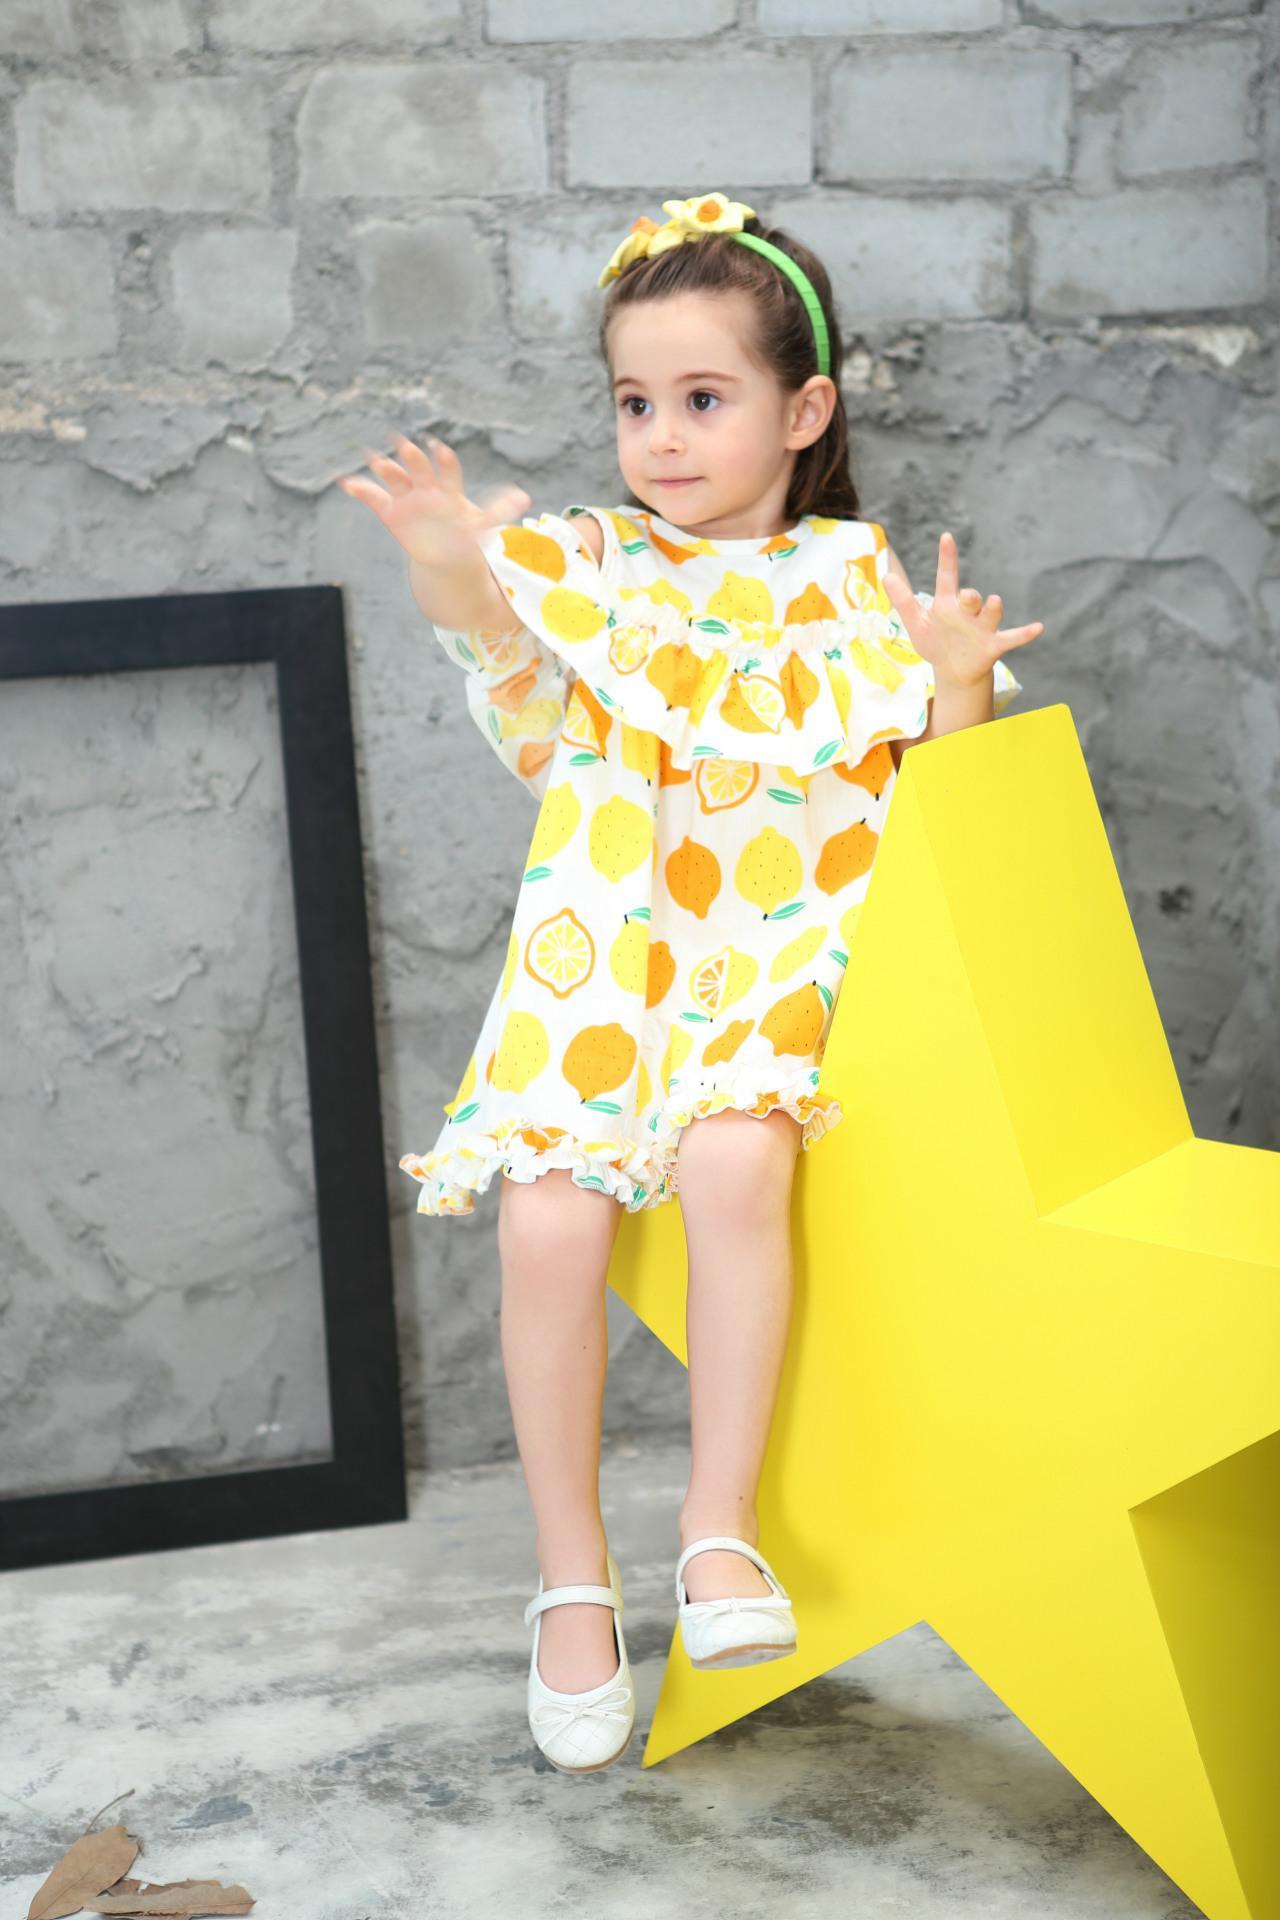 Lemon Printd Girls Dress 2018 New Summer Fashion Children Princess Dress Kids Children Clothes For 2 3 4 5 6 7 8 Years 7